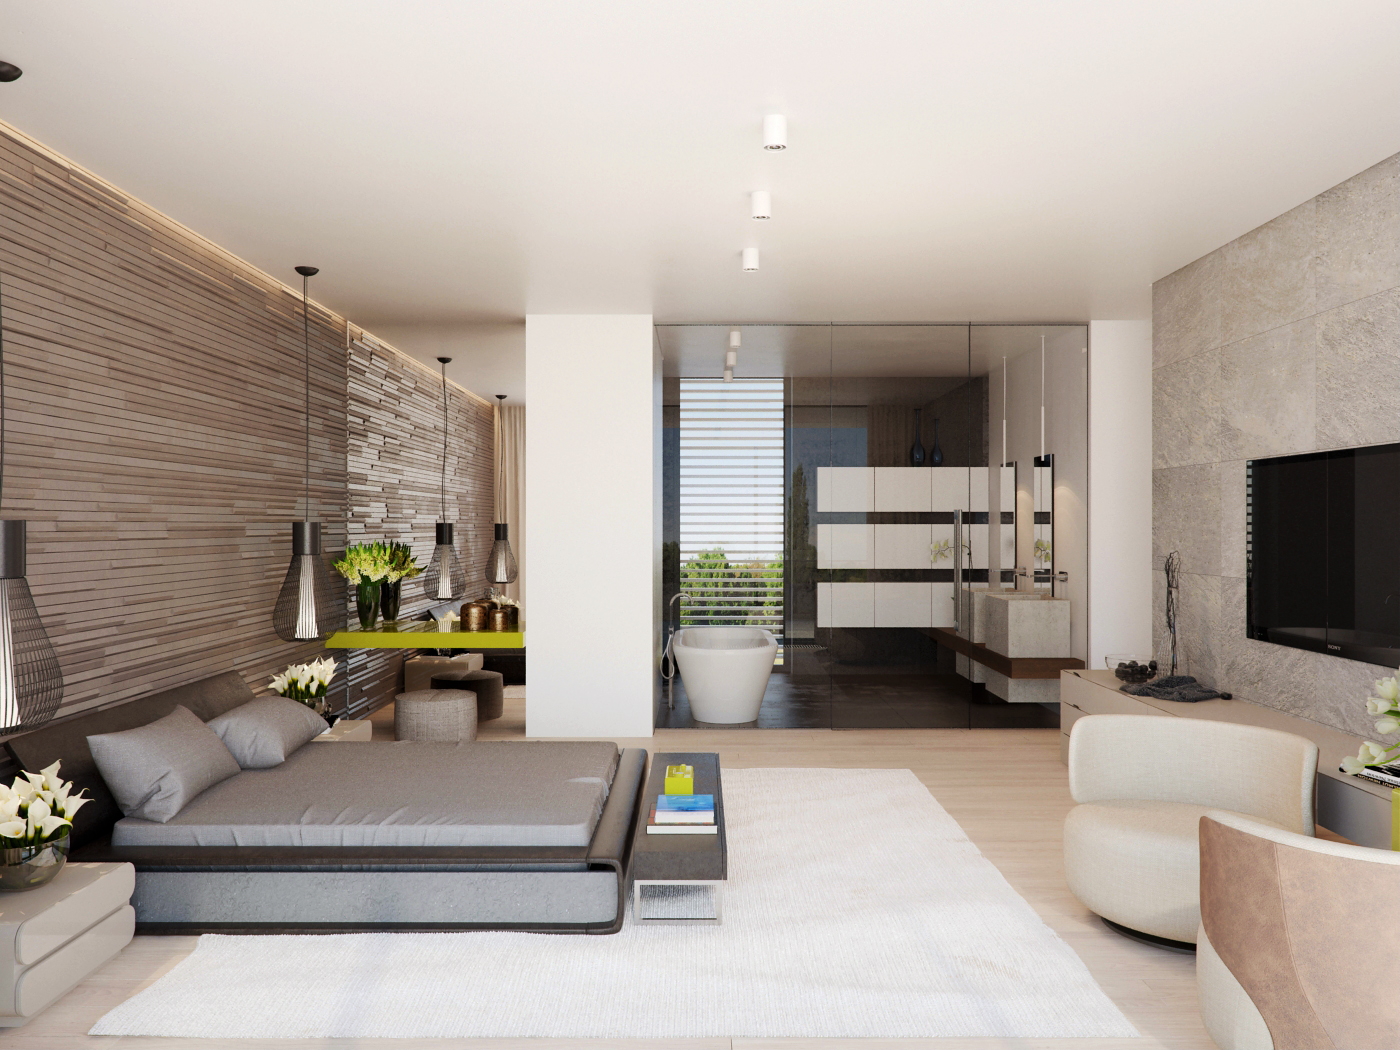 modernmasterbedroom  Interior Design Ideas